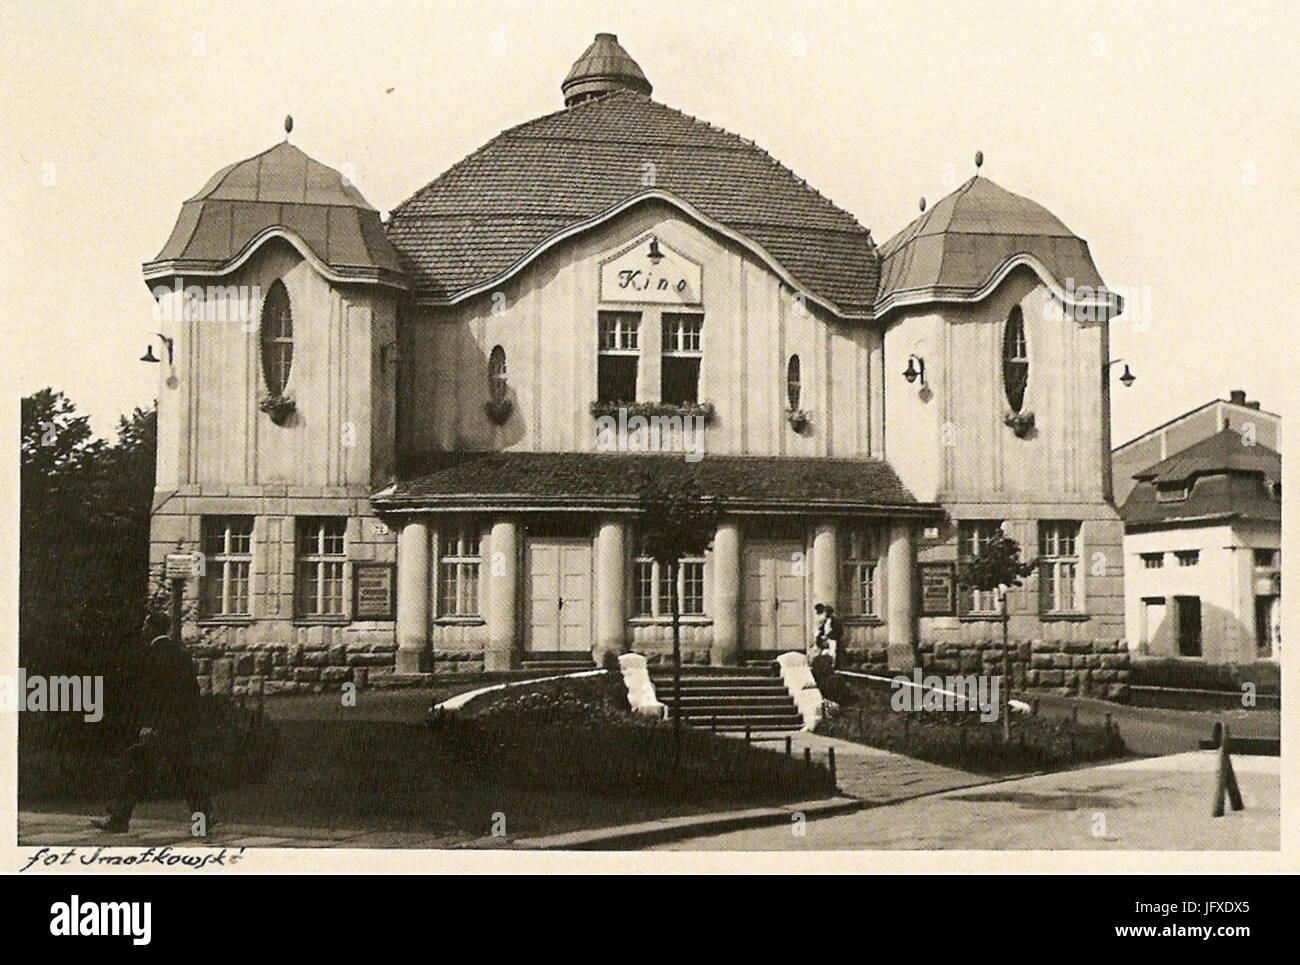 Bielsko-Biała, Kino Wanda - Stock Image